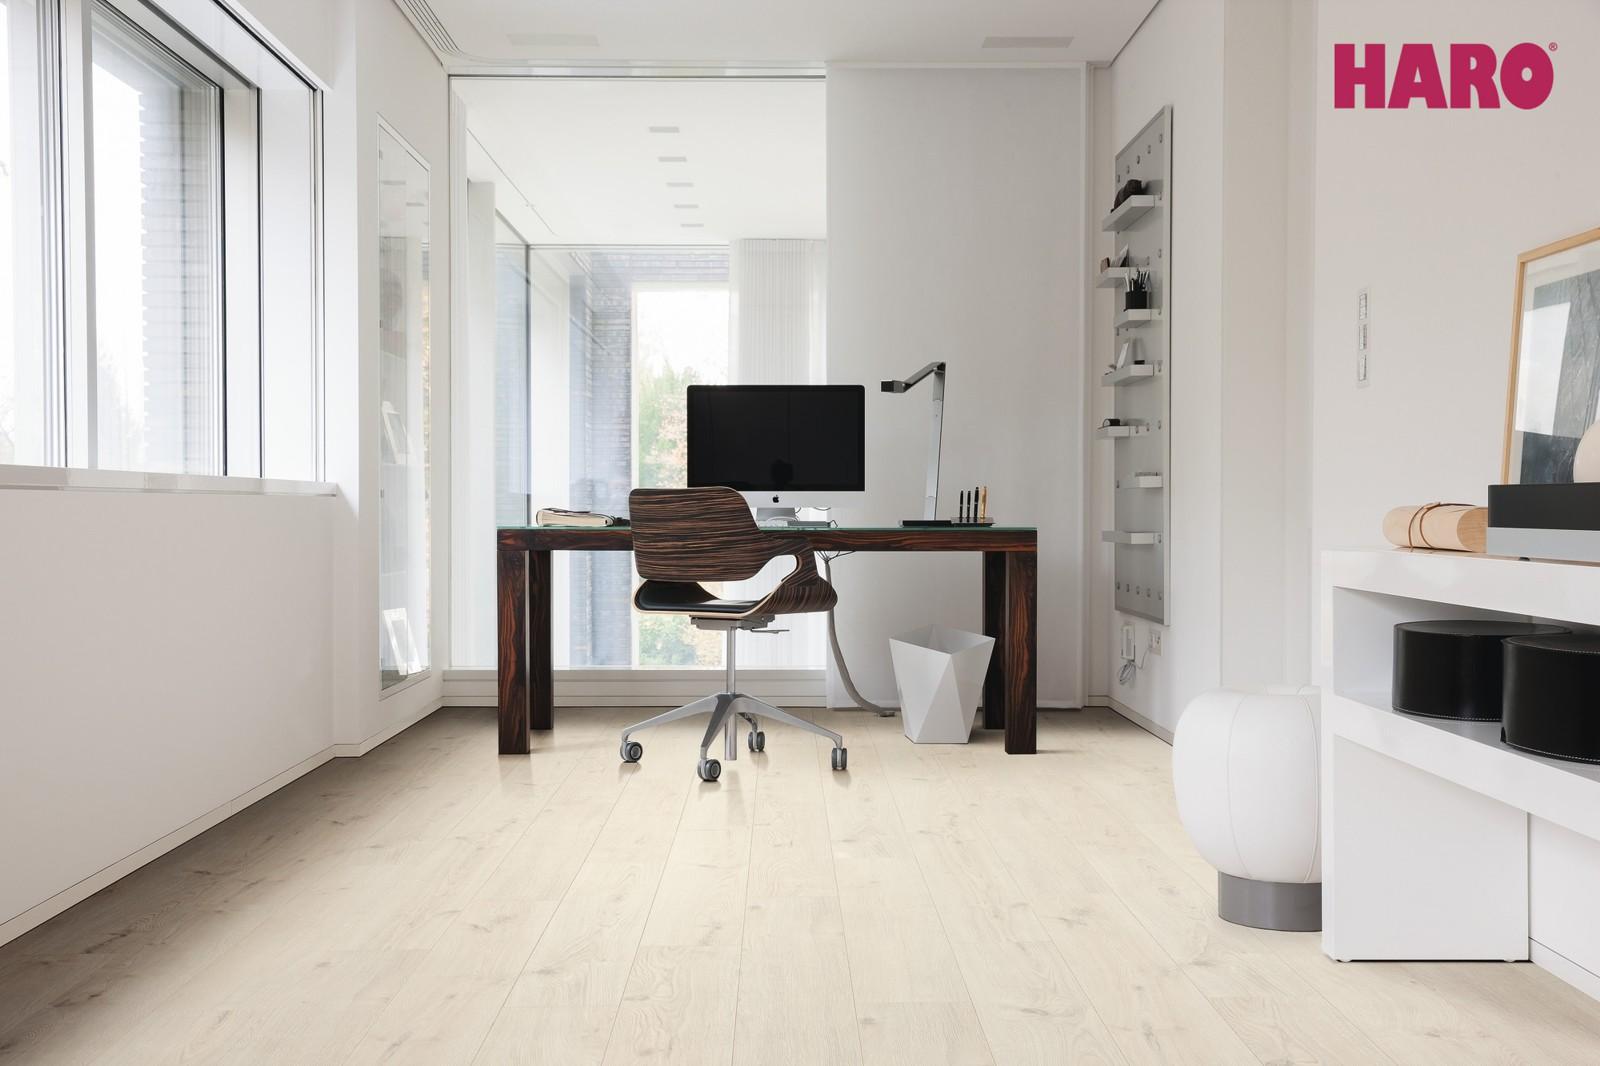 laminaatti tritty 100 tammi portland valkoinen lankku. Black Bedroom Furniture Sets. Home Design Ideas